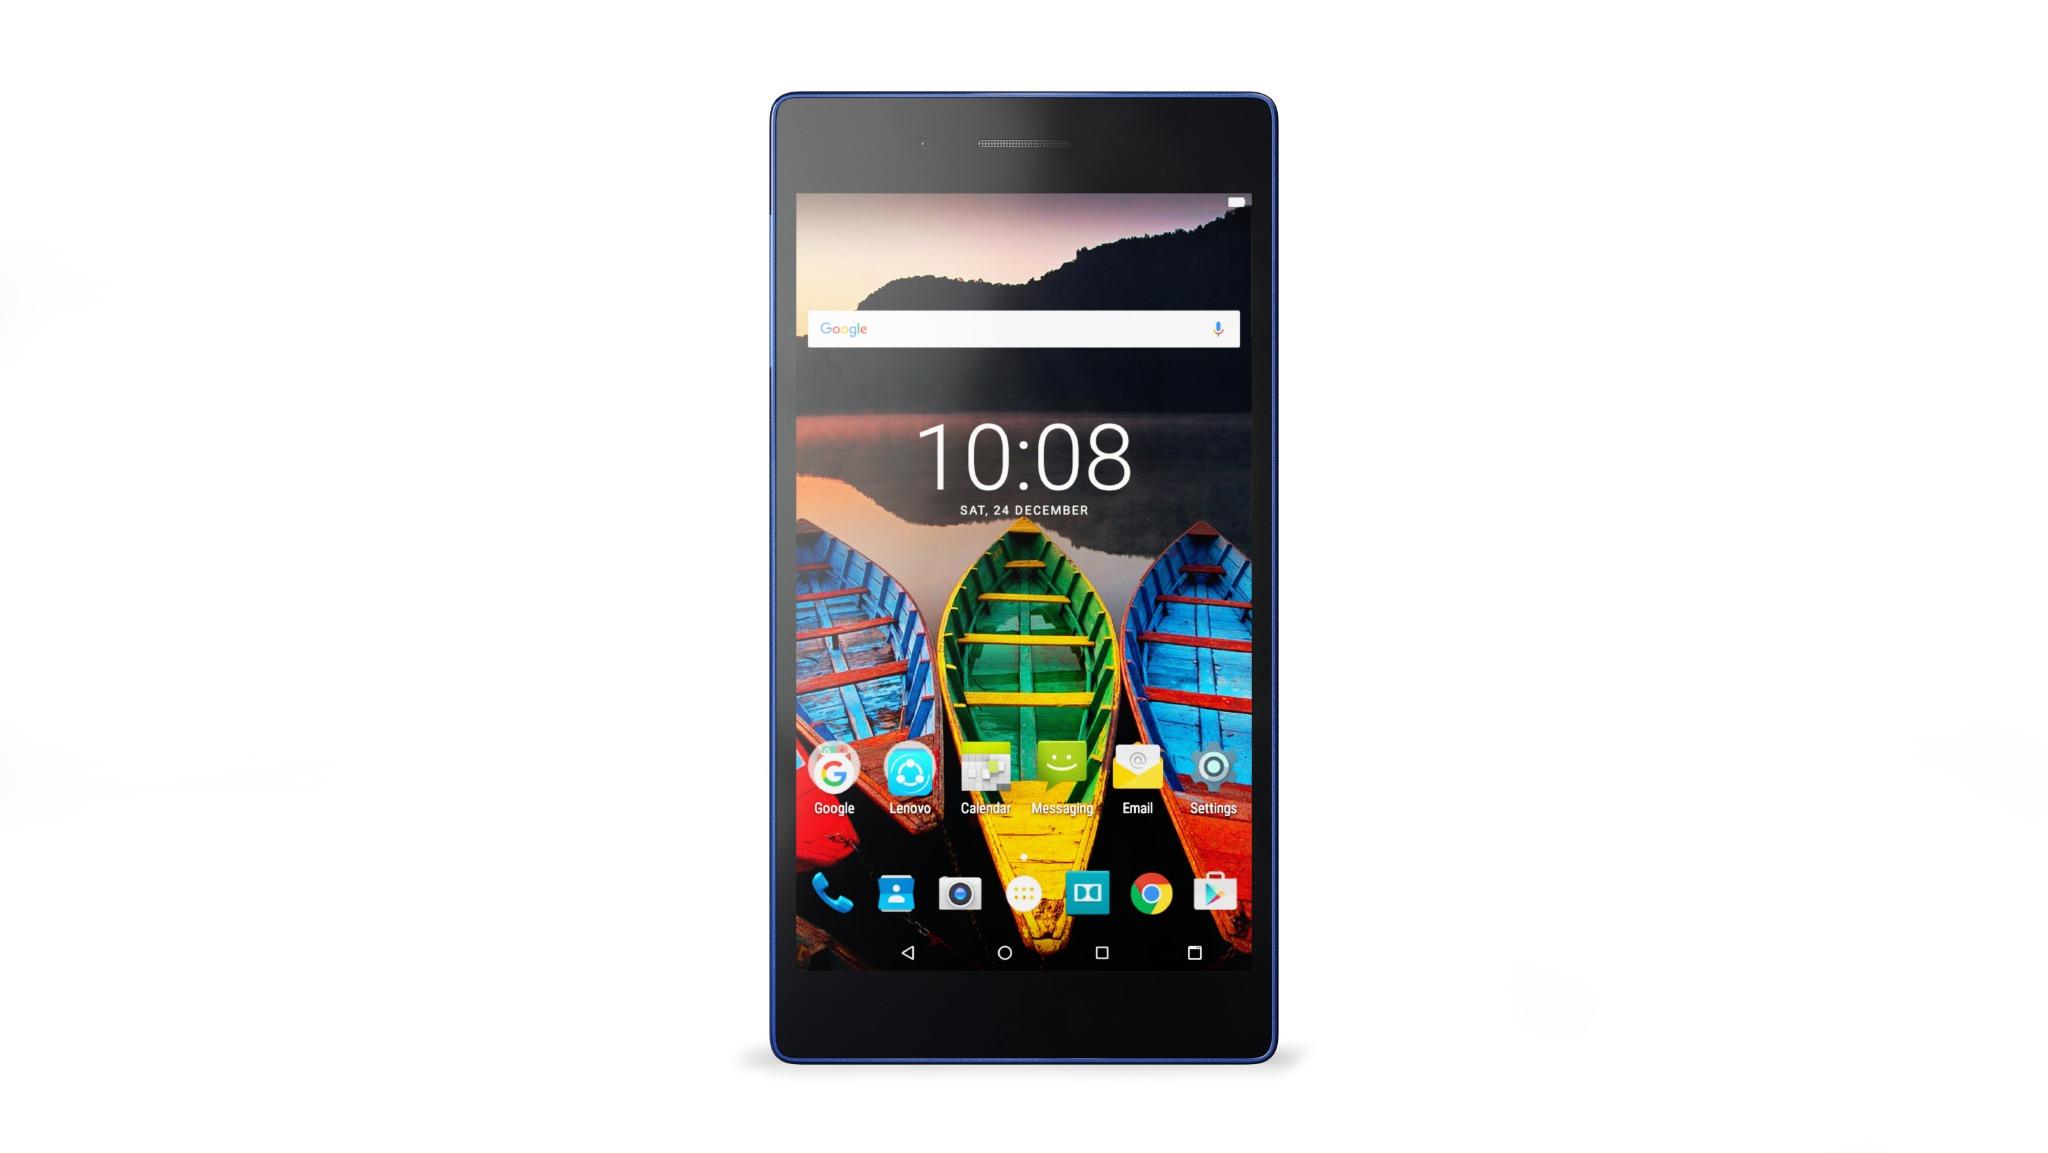 "Lenovo TAB3 8 MTK-QC 1,0GHz/2GB/16GB/8"" IPS/1280x800/Wi-Fi/Android 6.0 černá ZA170135CZ"